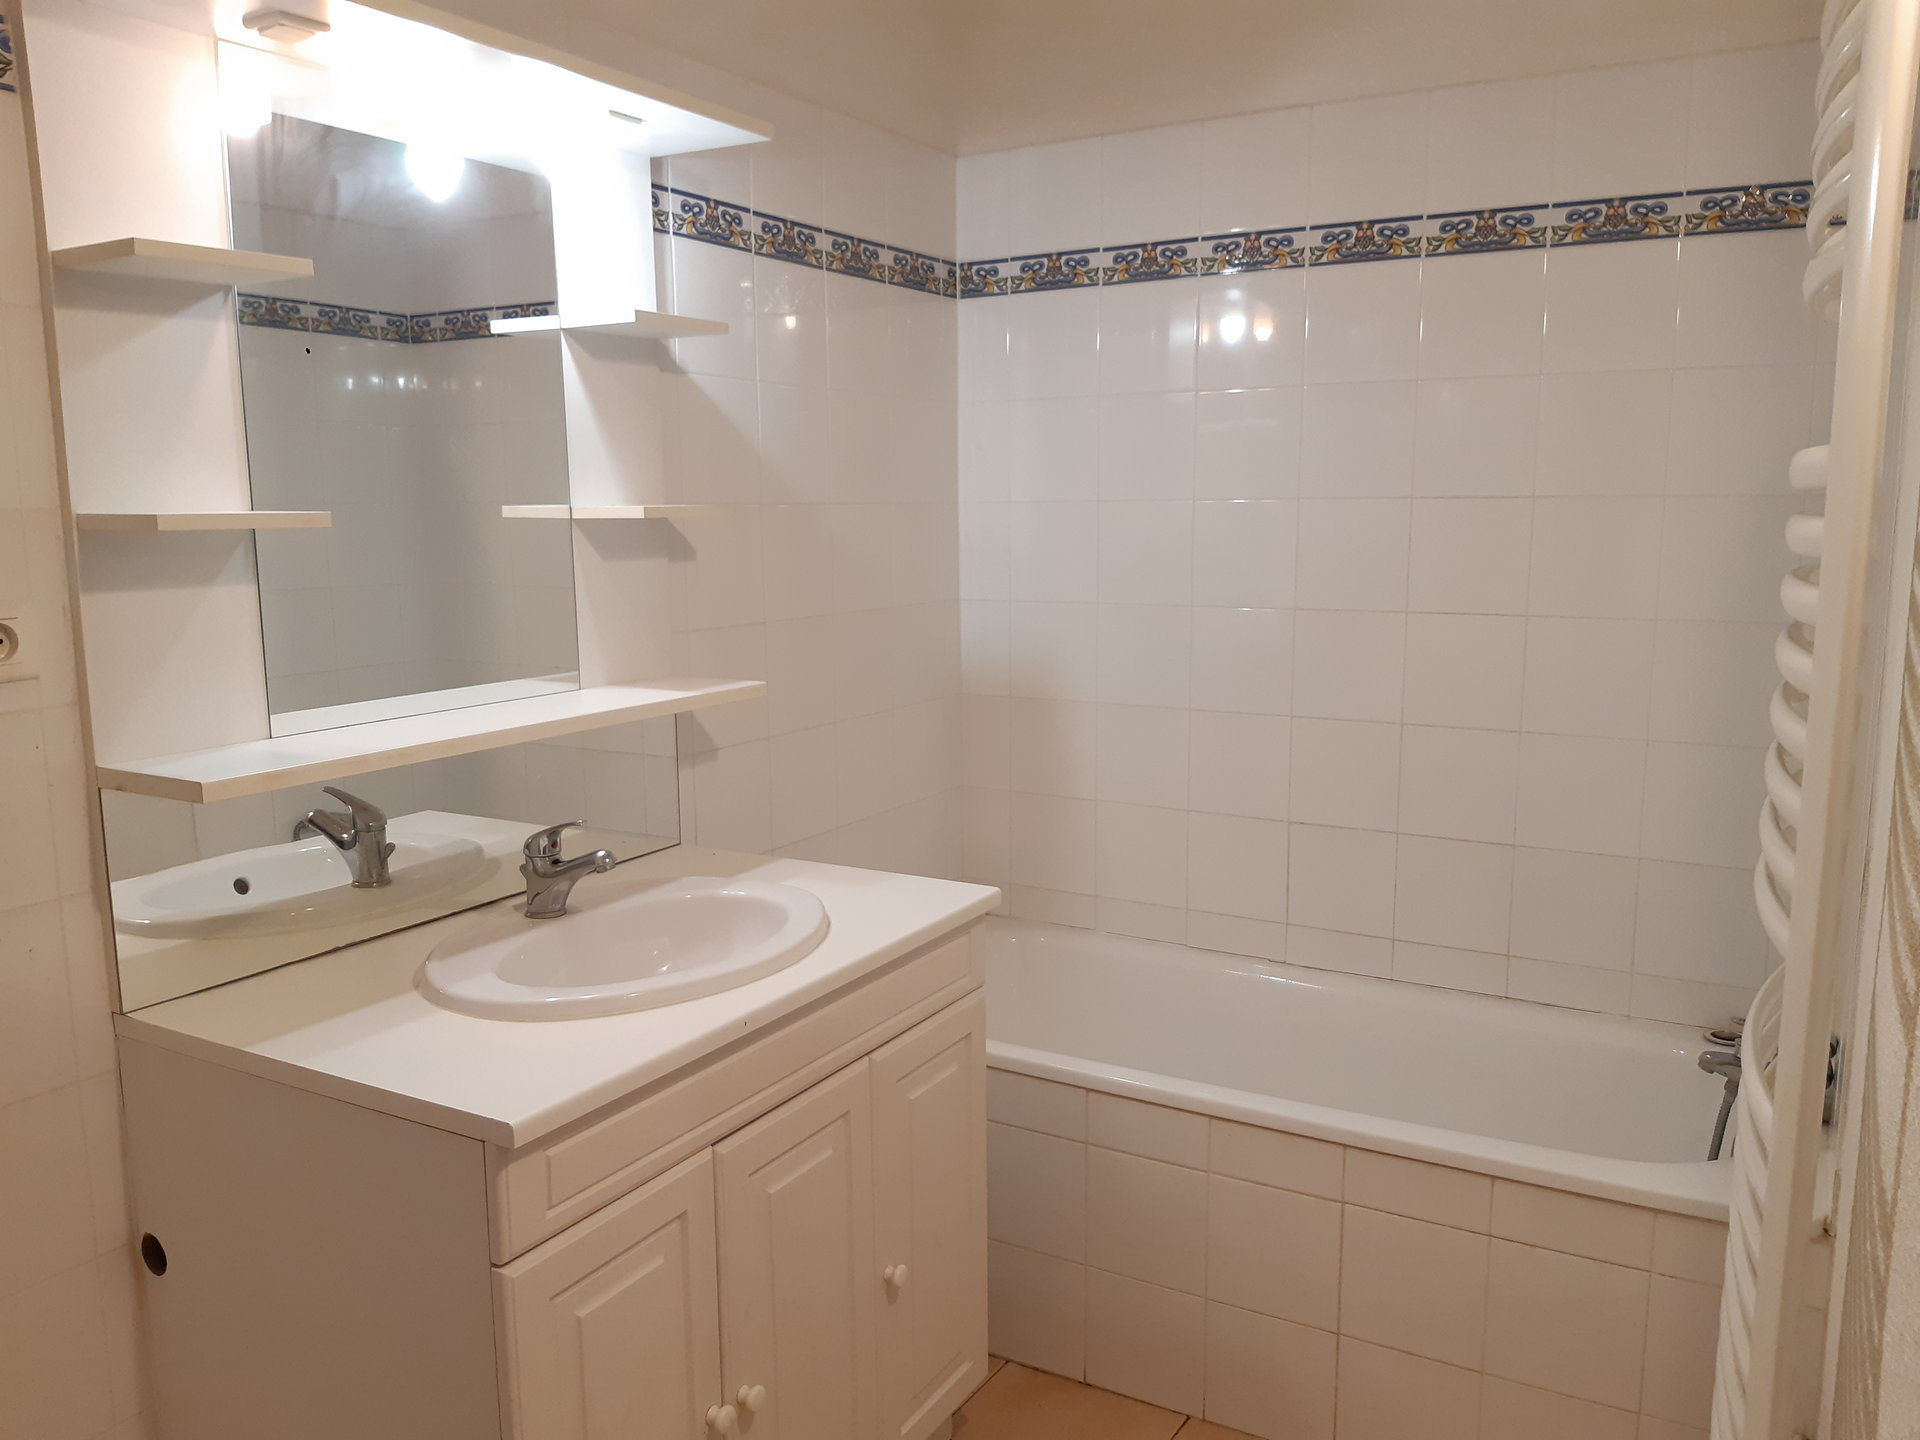 Location Appartement BEAUCAIRE radiateur, individuel, gaz chauffage